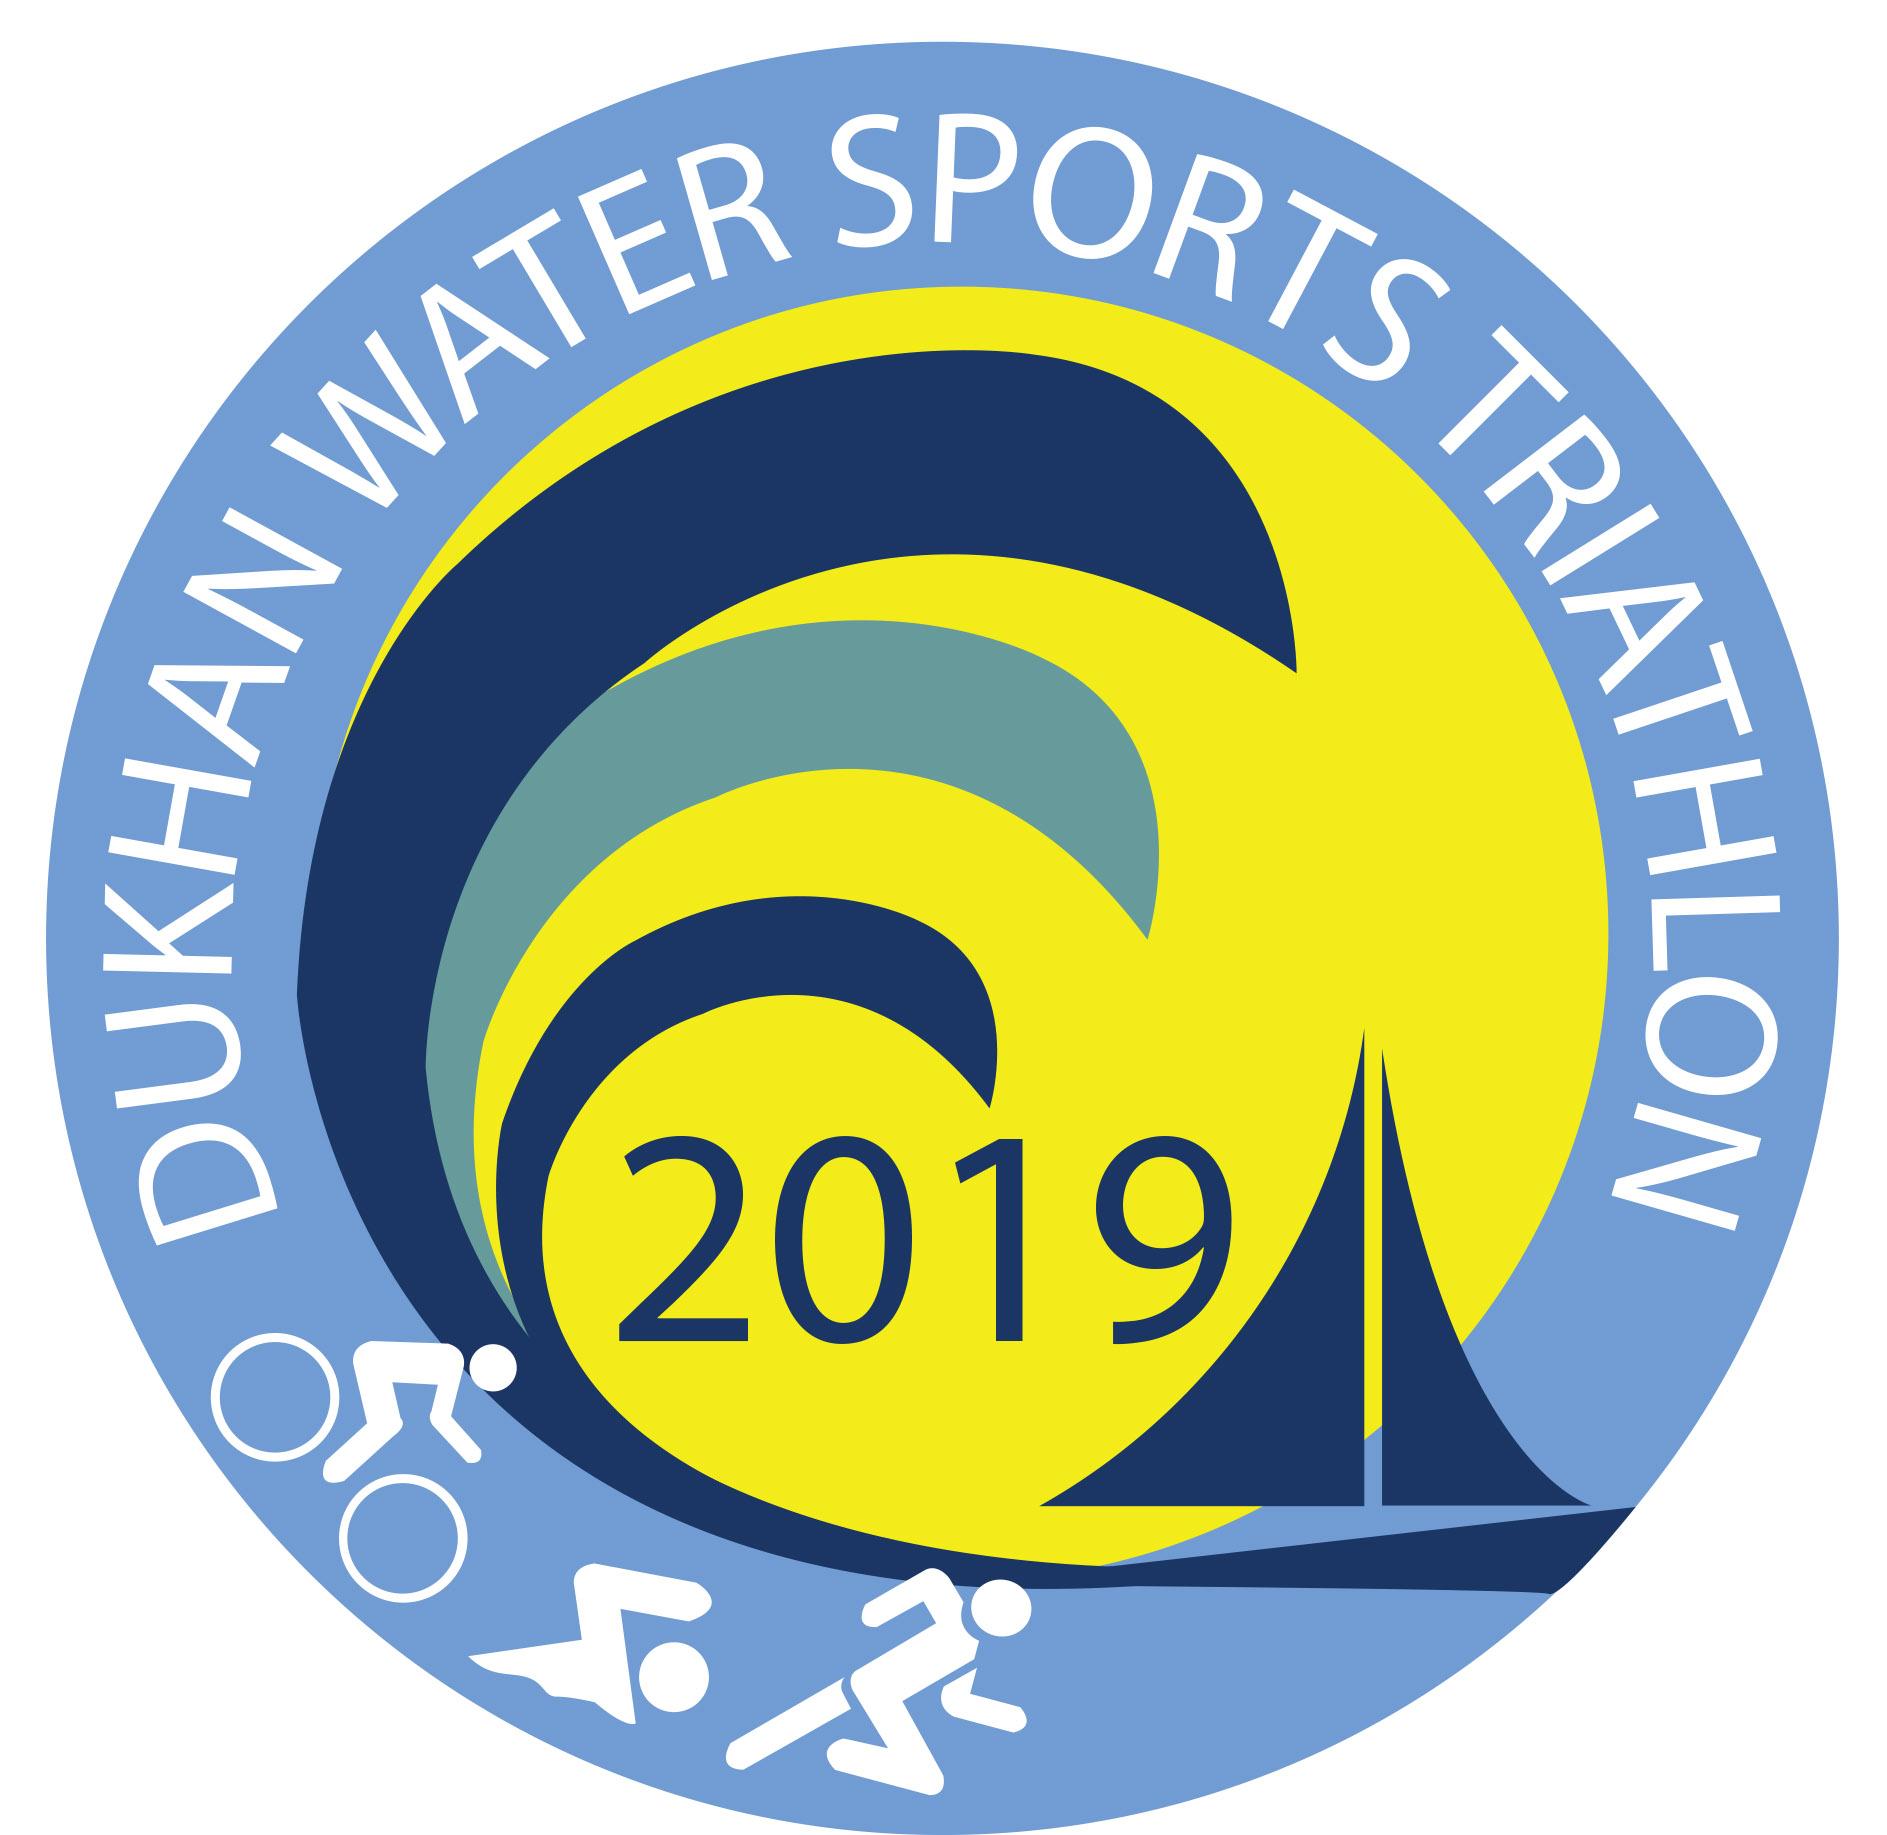 Tri Club Doha - Dukhan Triathlon